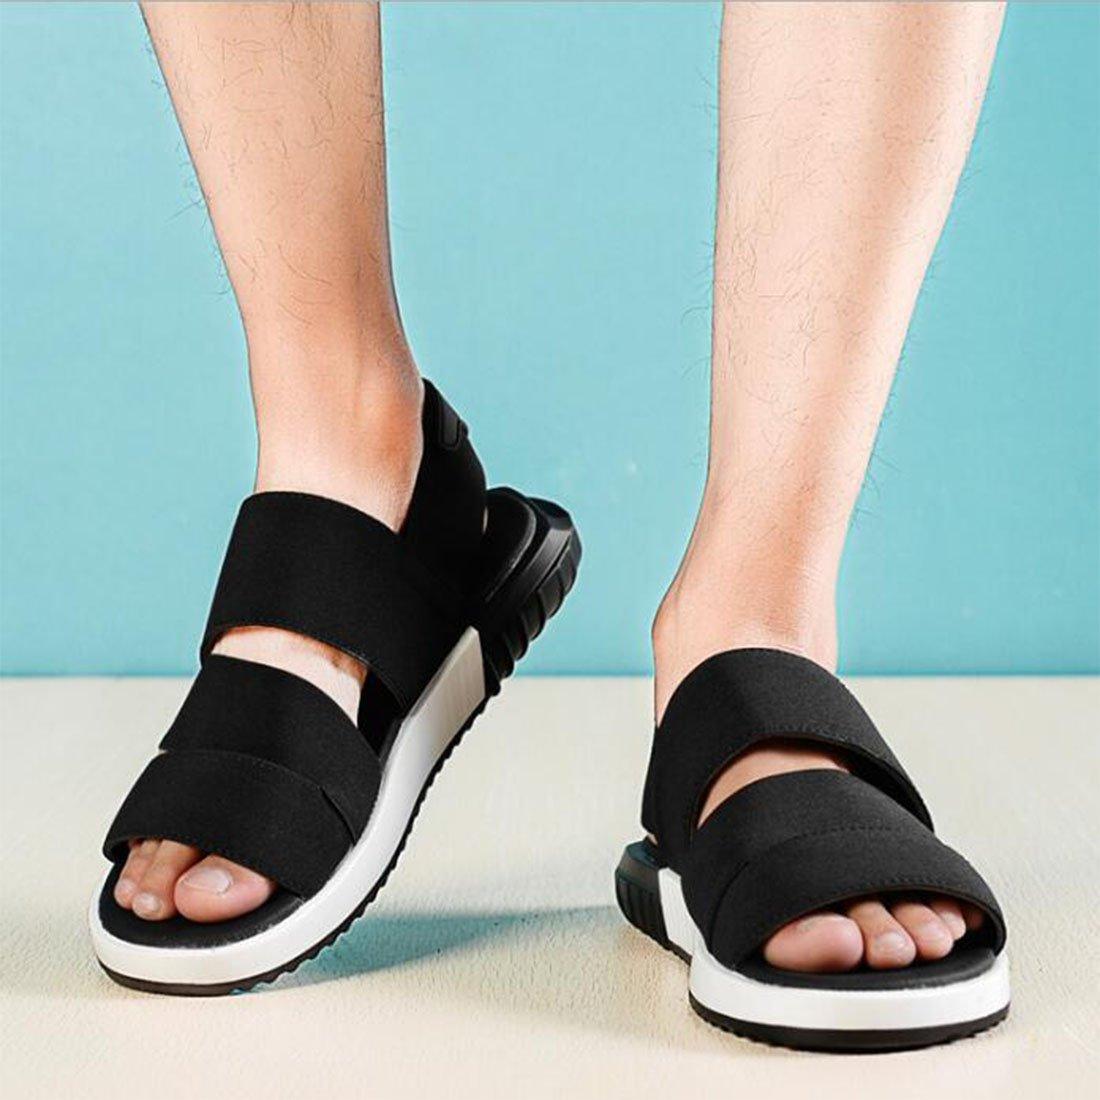 ZHONGST Sommer Sandalen Beach Paare Toes Casual Fashion Beach Sandalen Schuhe schwarz eb38bd